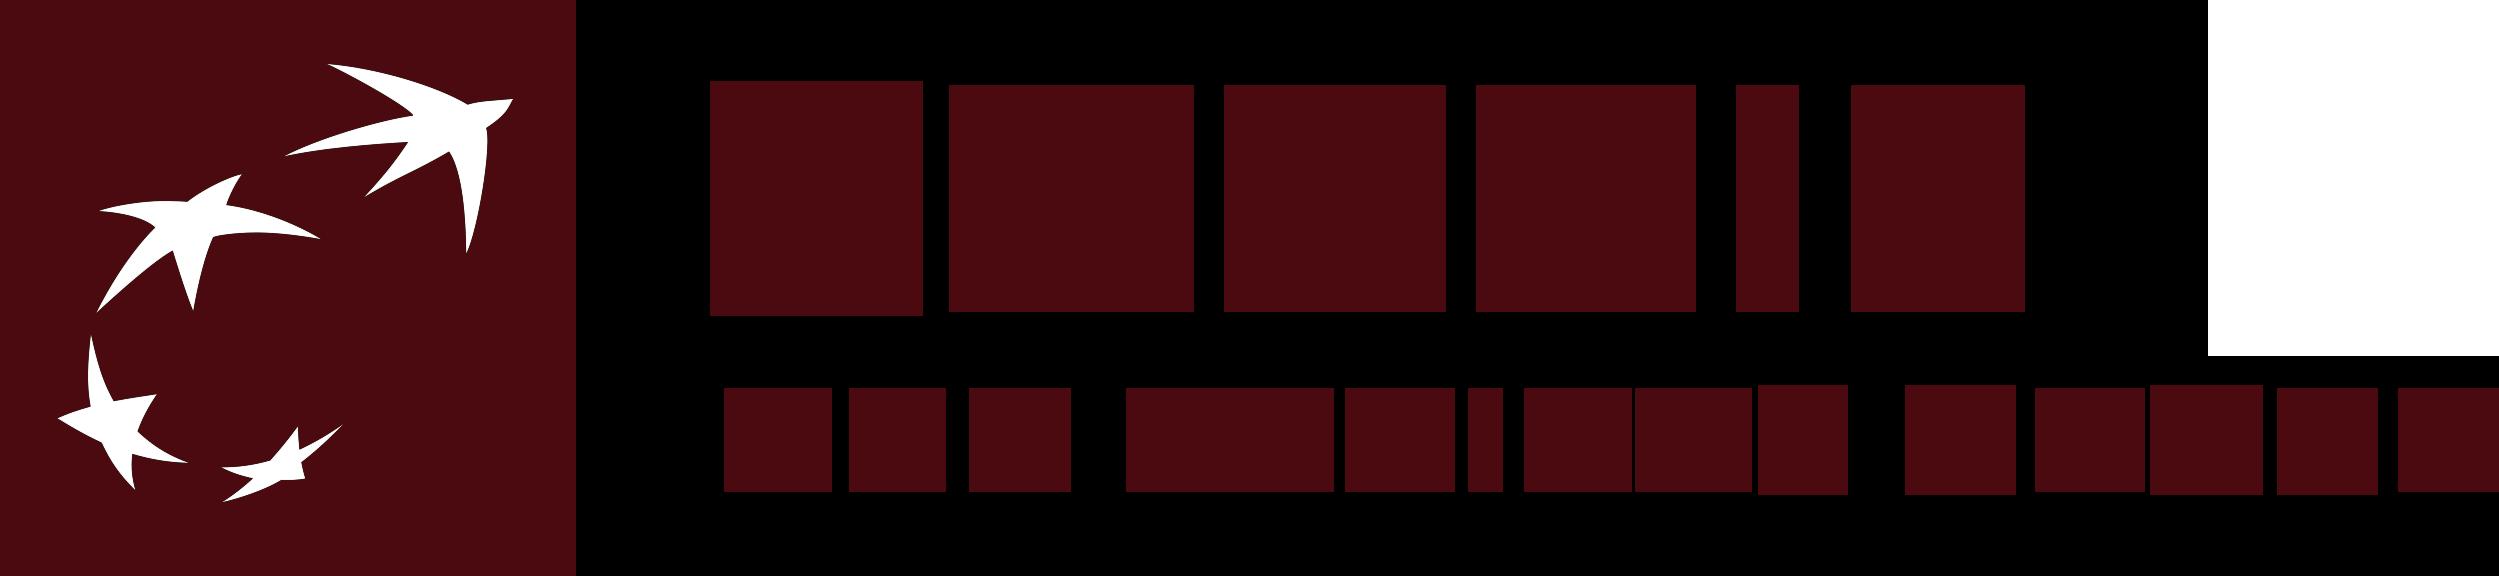 Cardif BNP Paribas Group logo